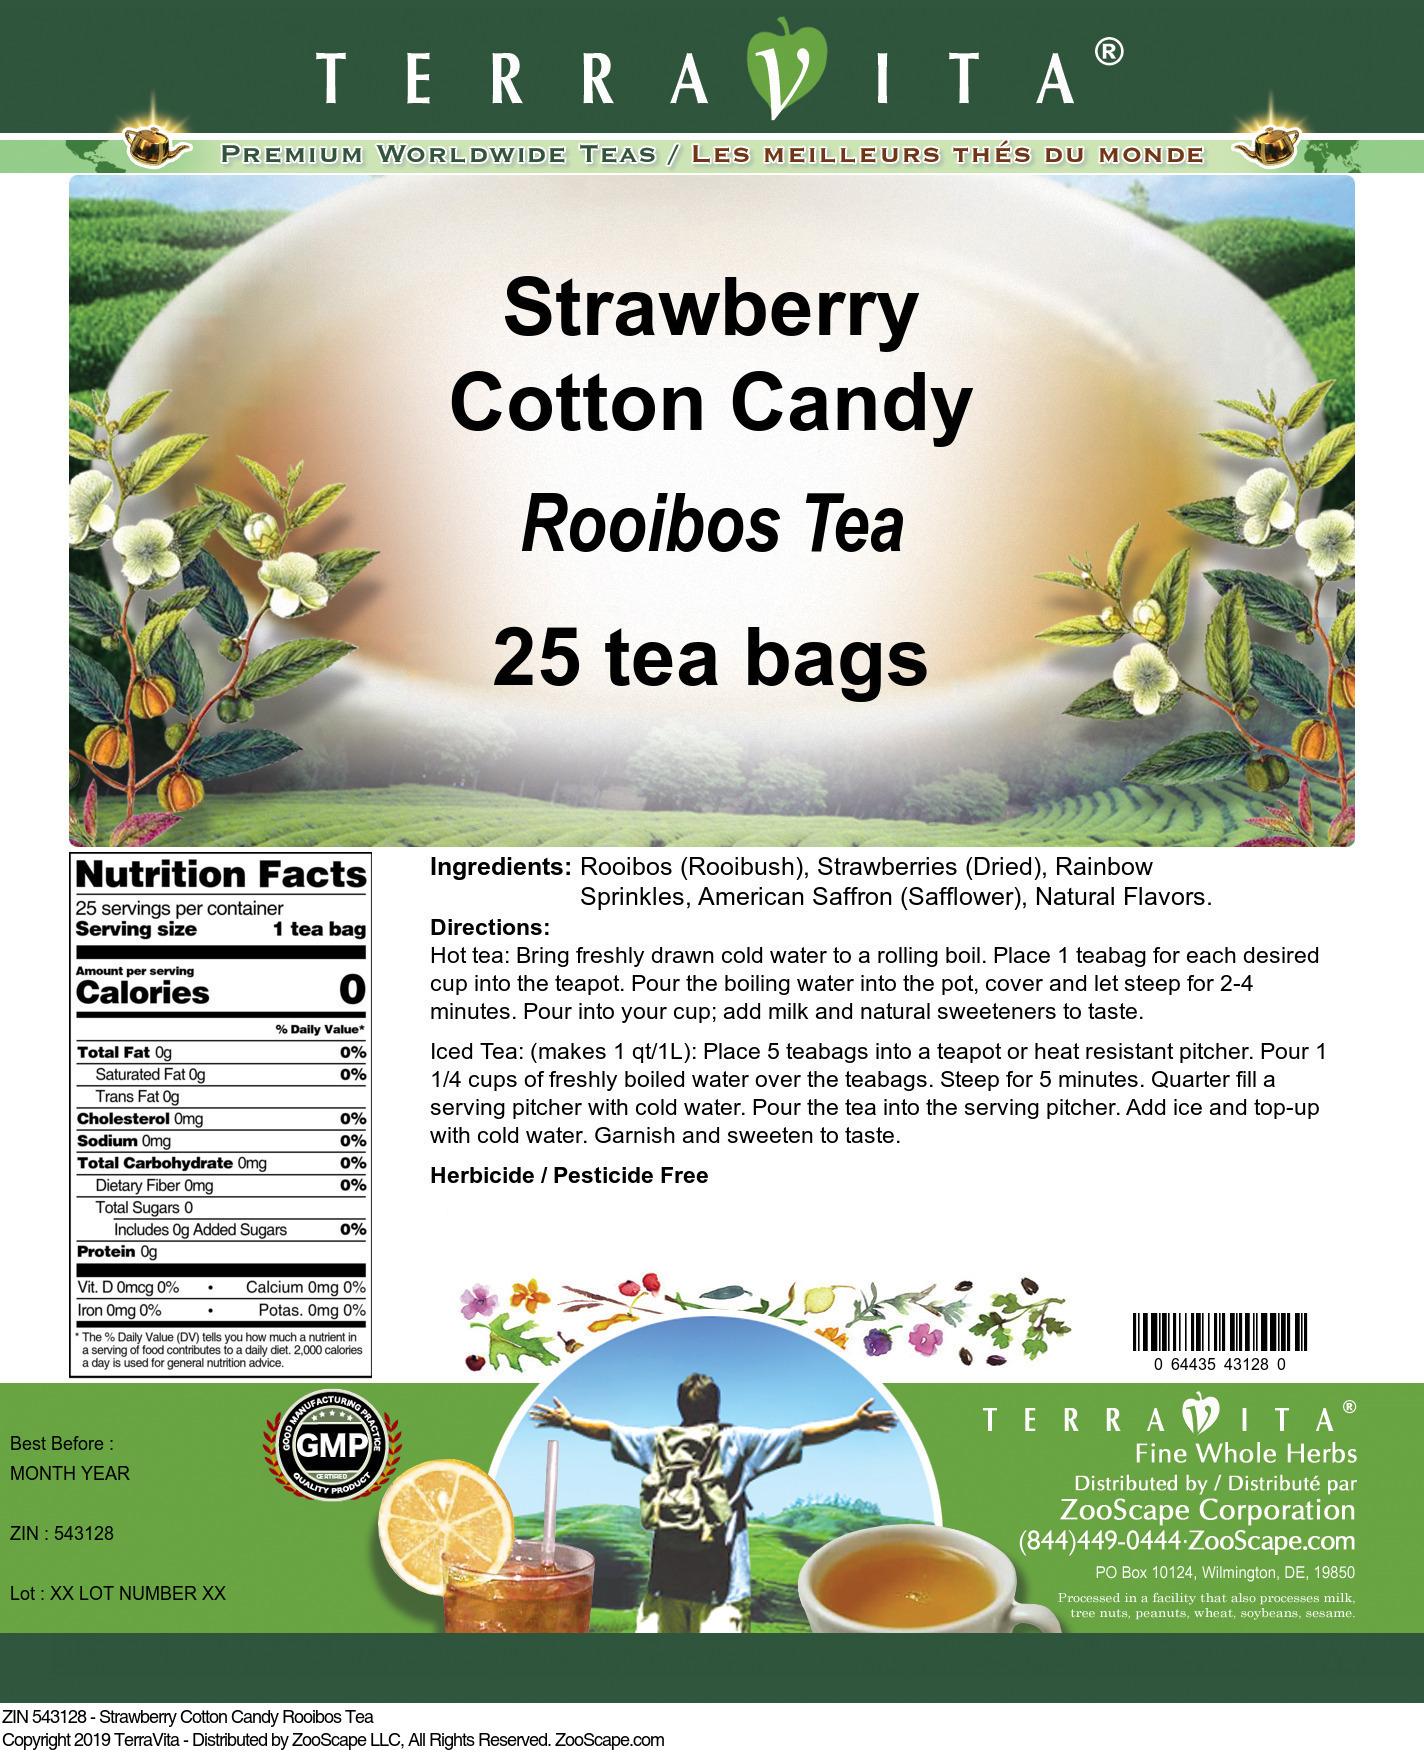 Strawberry Cotton Candy Rooibos Tea